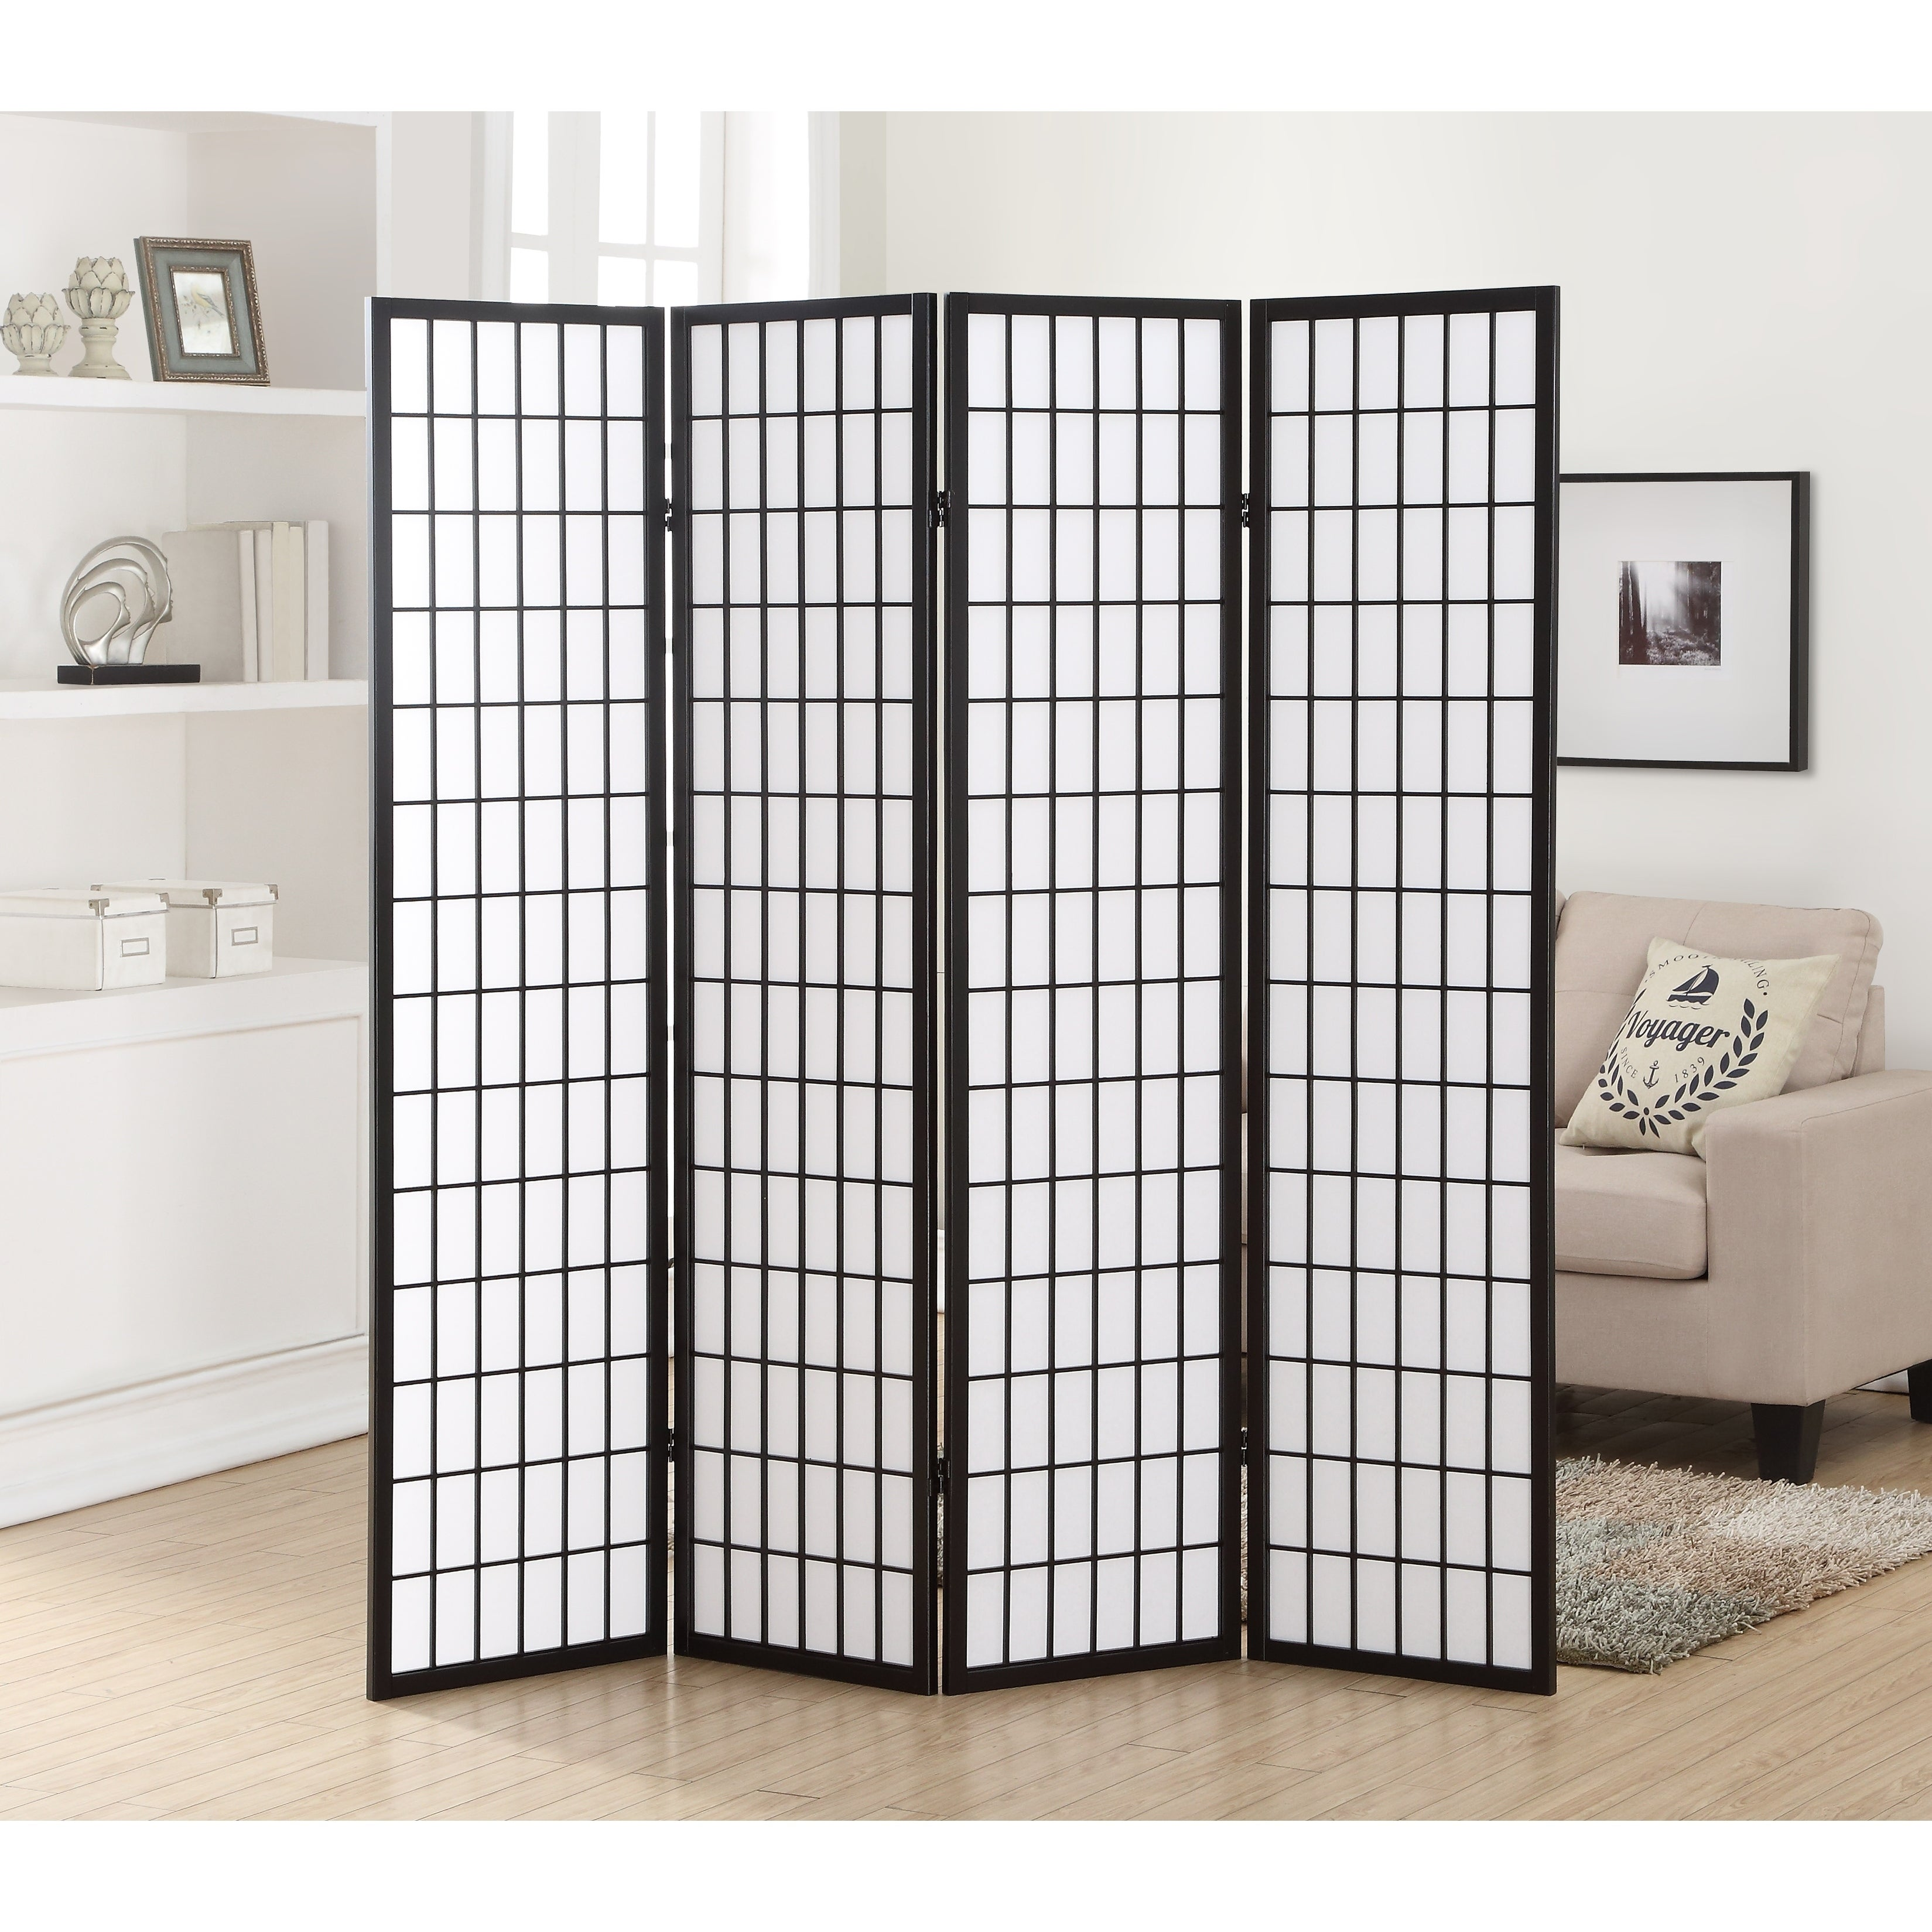 Hoceima Oriental Shoji 4 Panel Room Divider On Sale Overstock 14430760